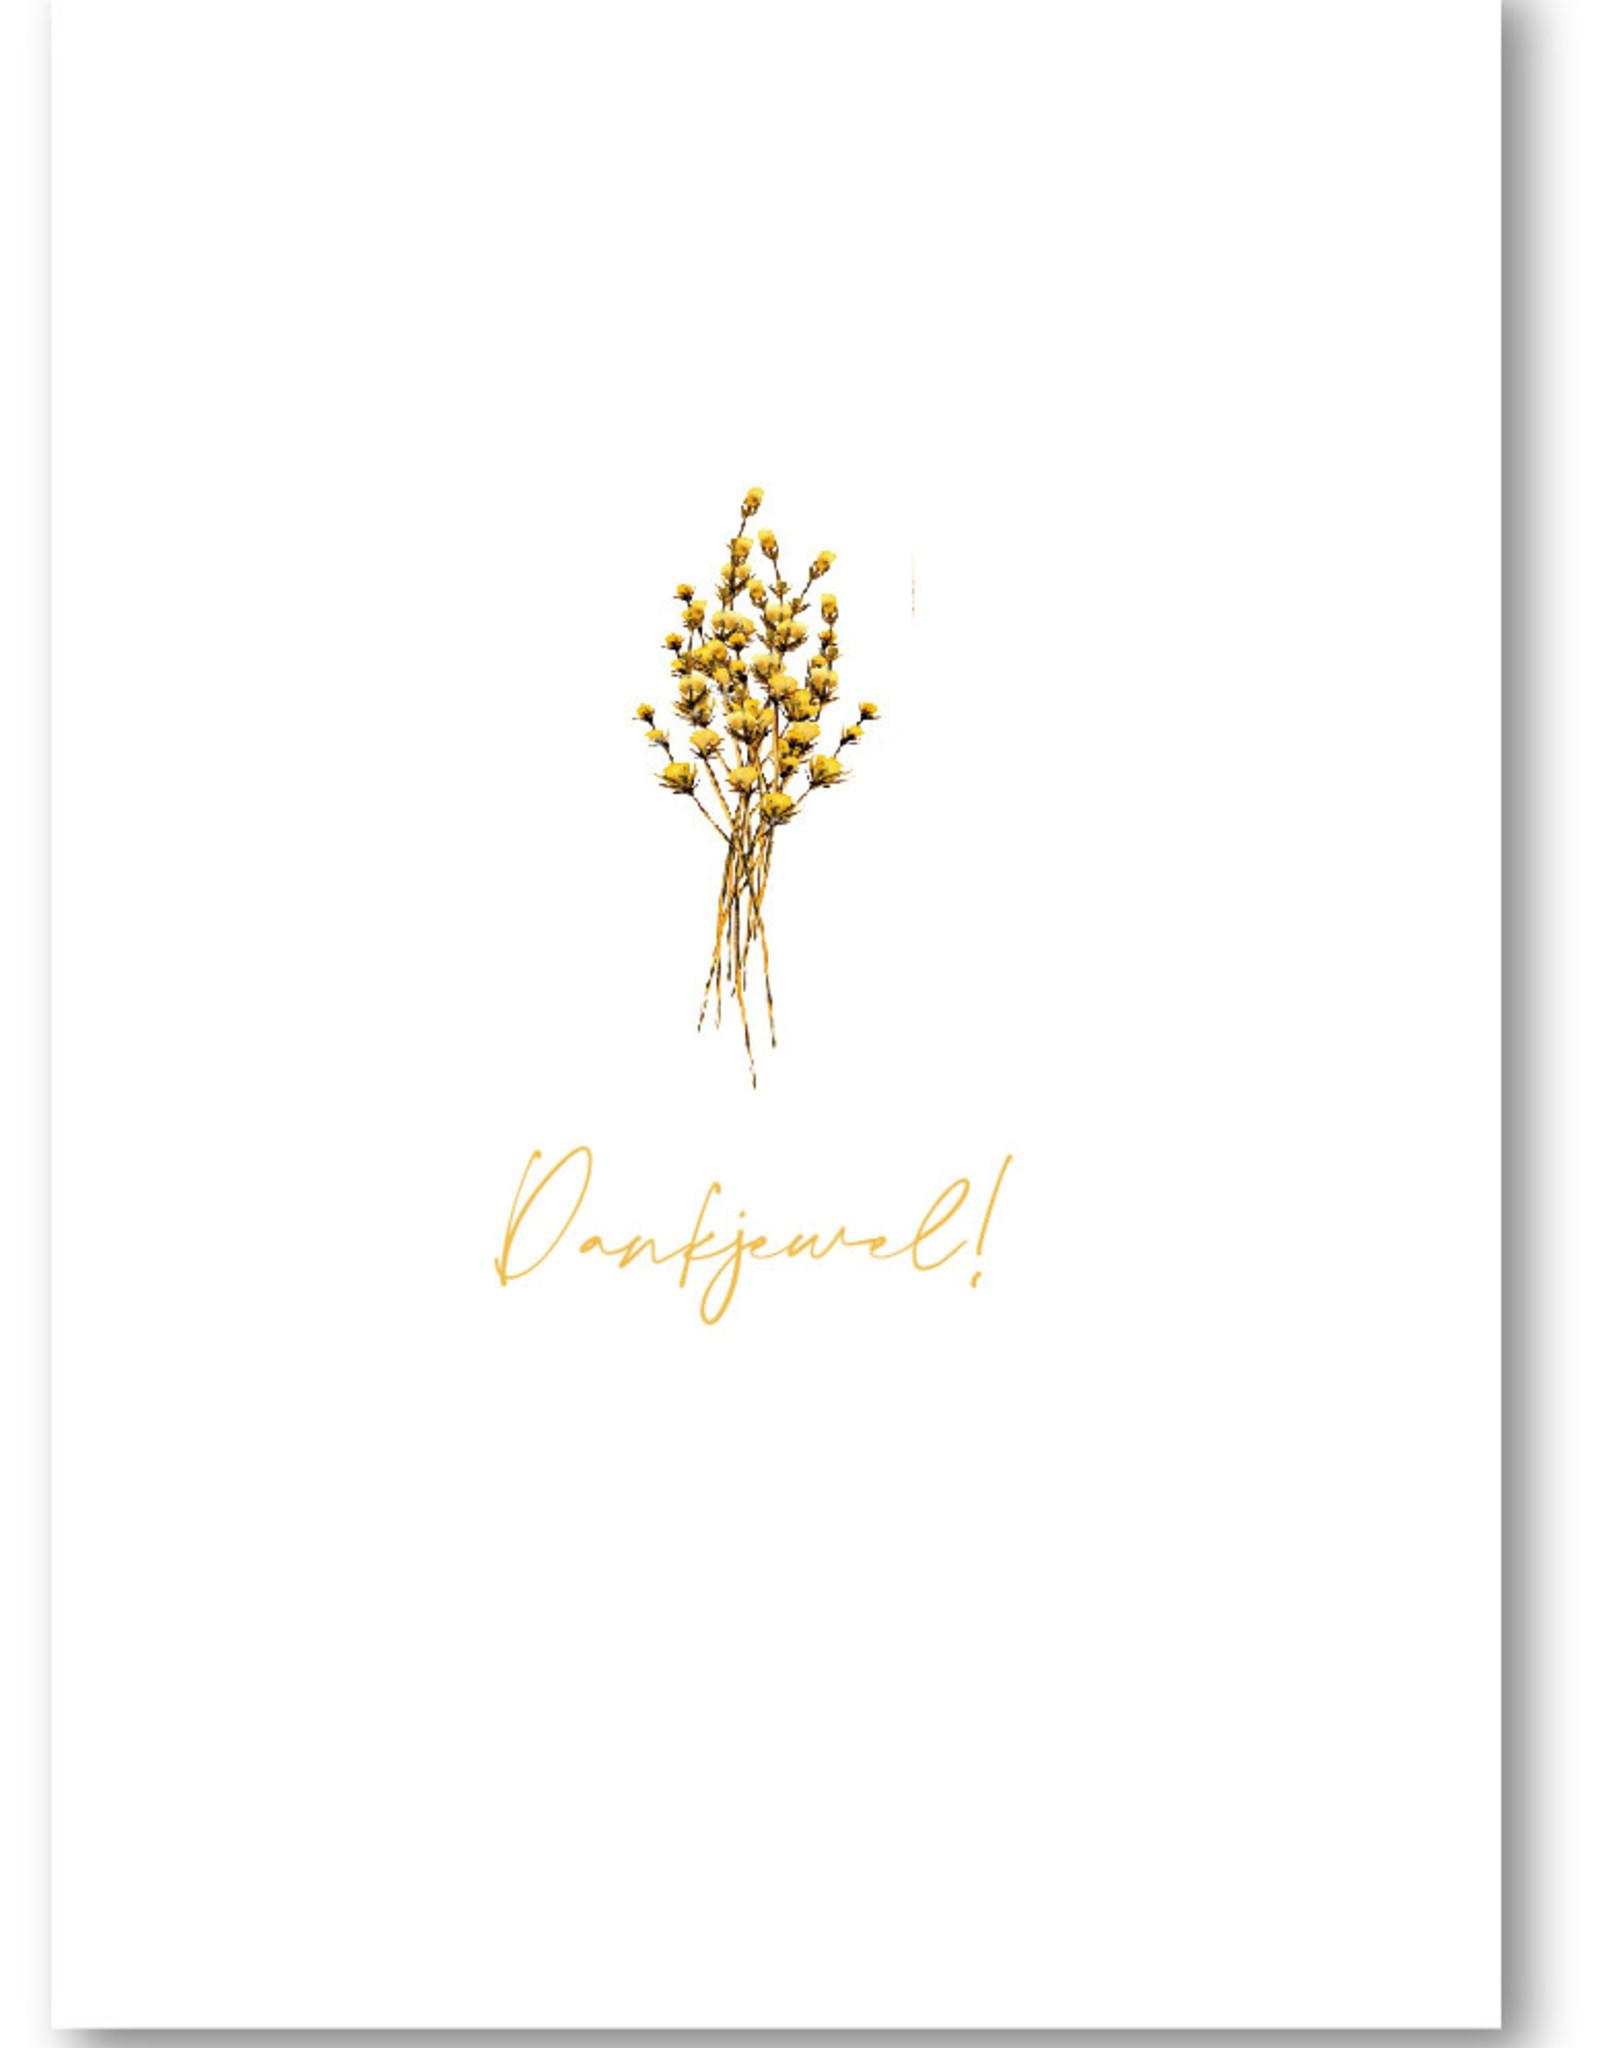 Makerij Meskens Makerij Meskens Kaartje A6: Dankjewel! droogbloemen